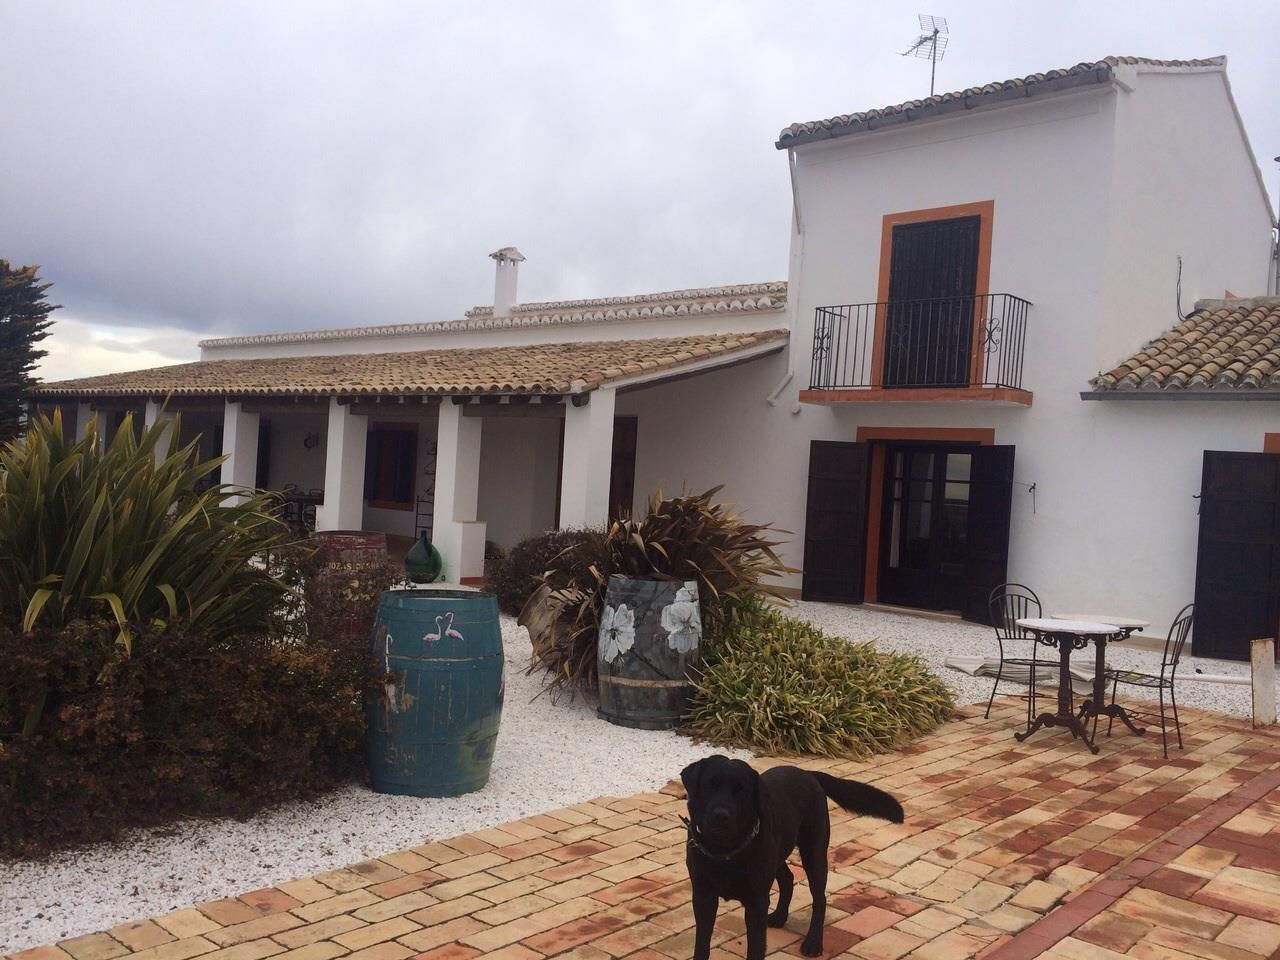 Terraza de Bodega Chozas Carrascal. Muebles de forja de www.fustaiferro.com  https://fustaiferro.wordpress.com/ #bodega #terraza #vino #valencia #fustaiferro #chozascarrascal